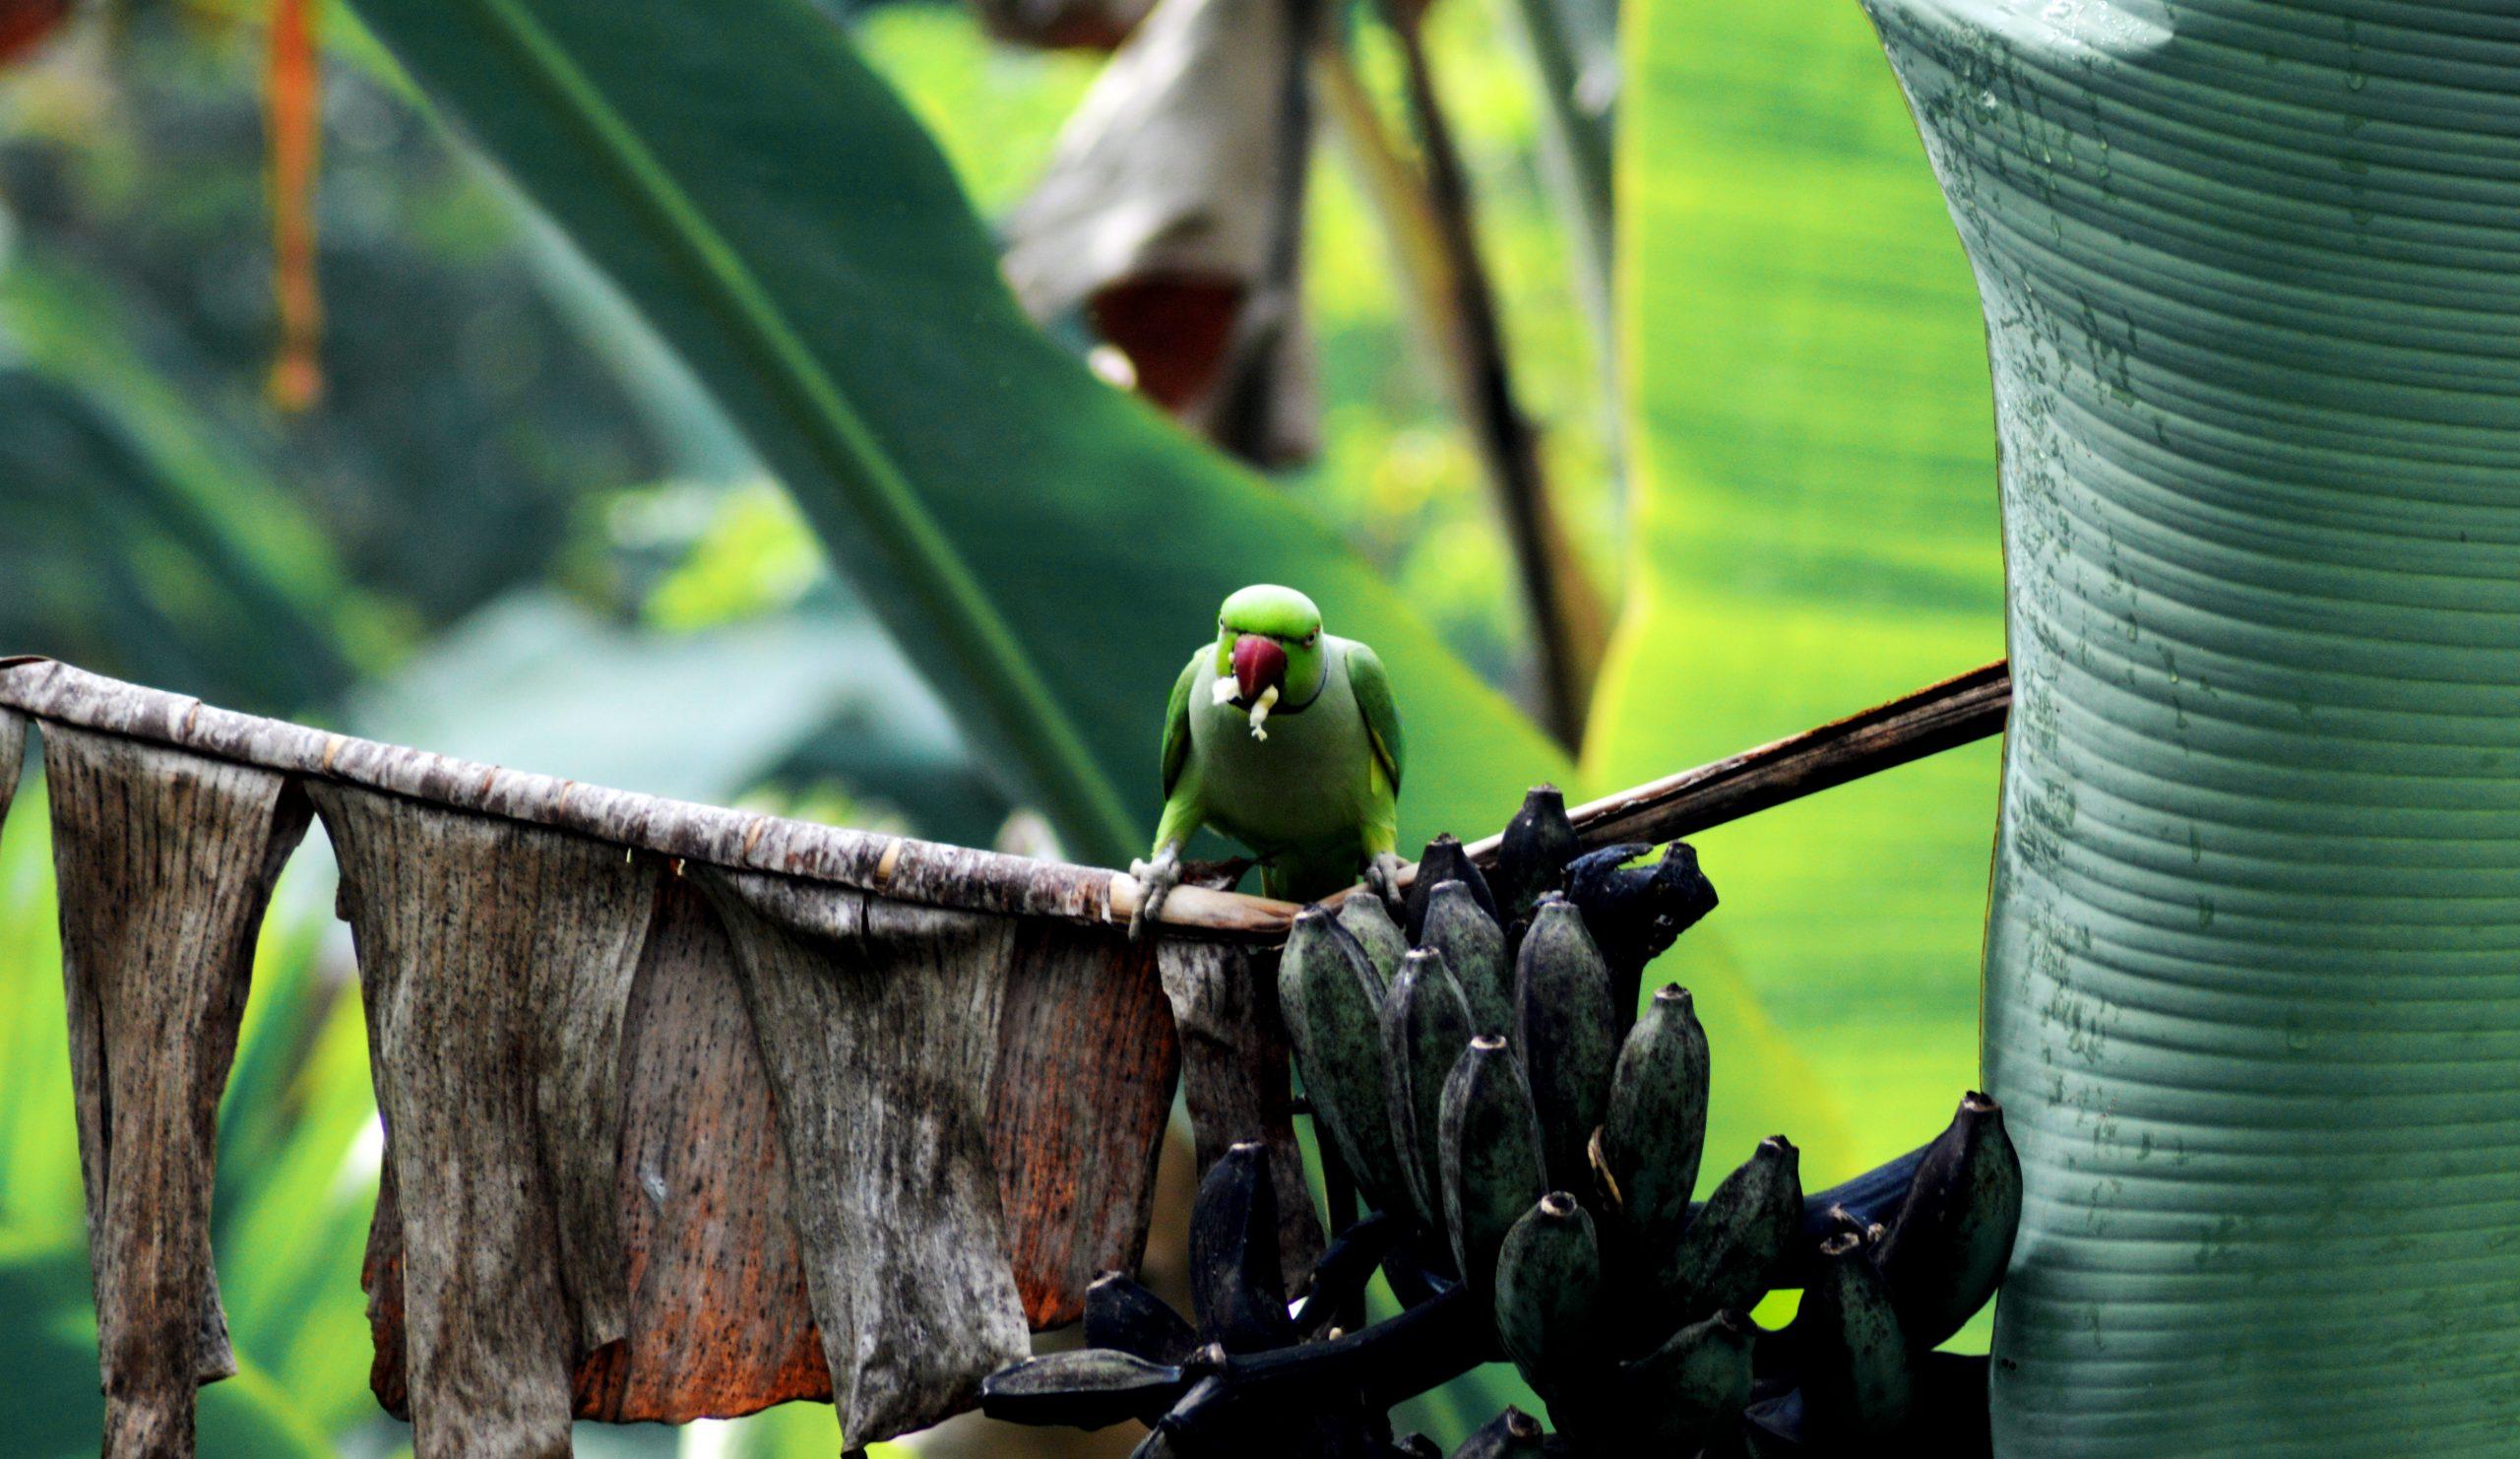 Parrot sitting on tree